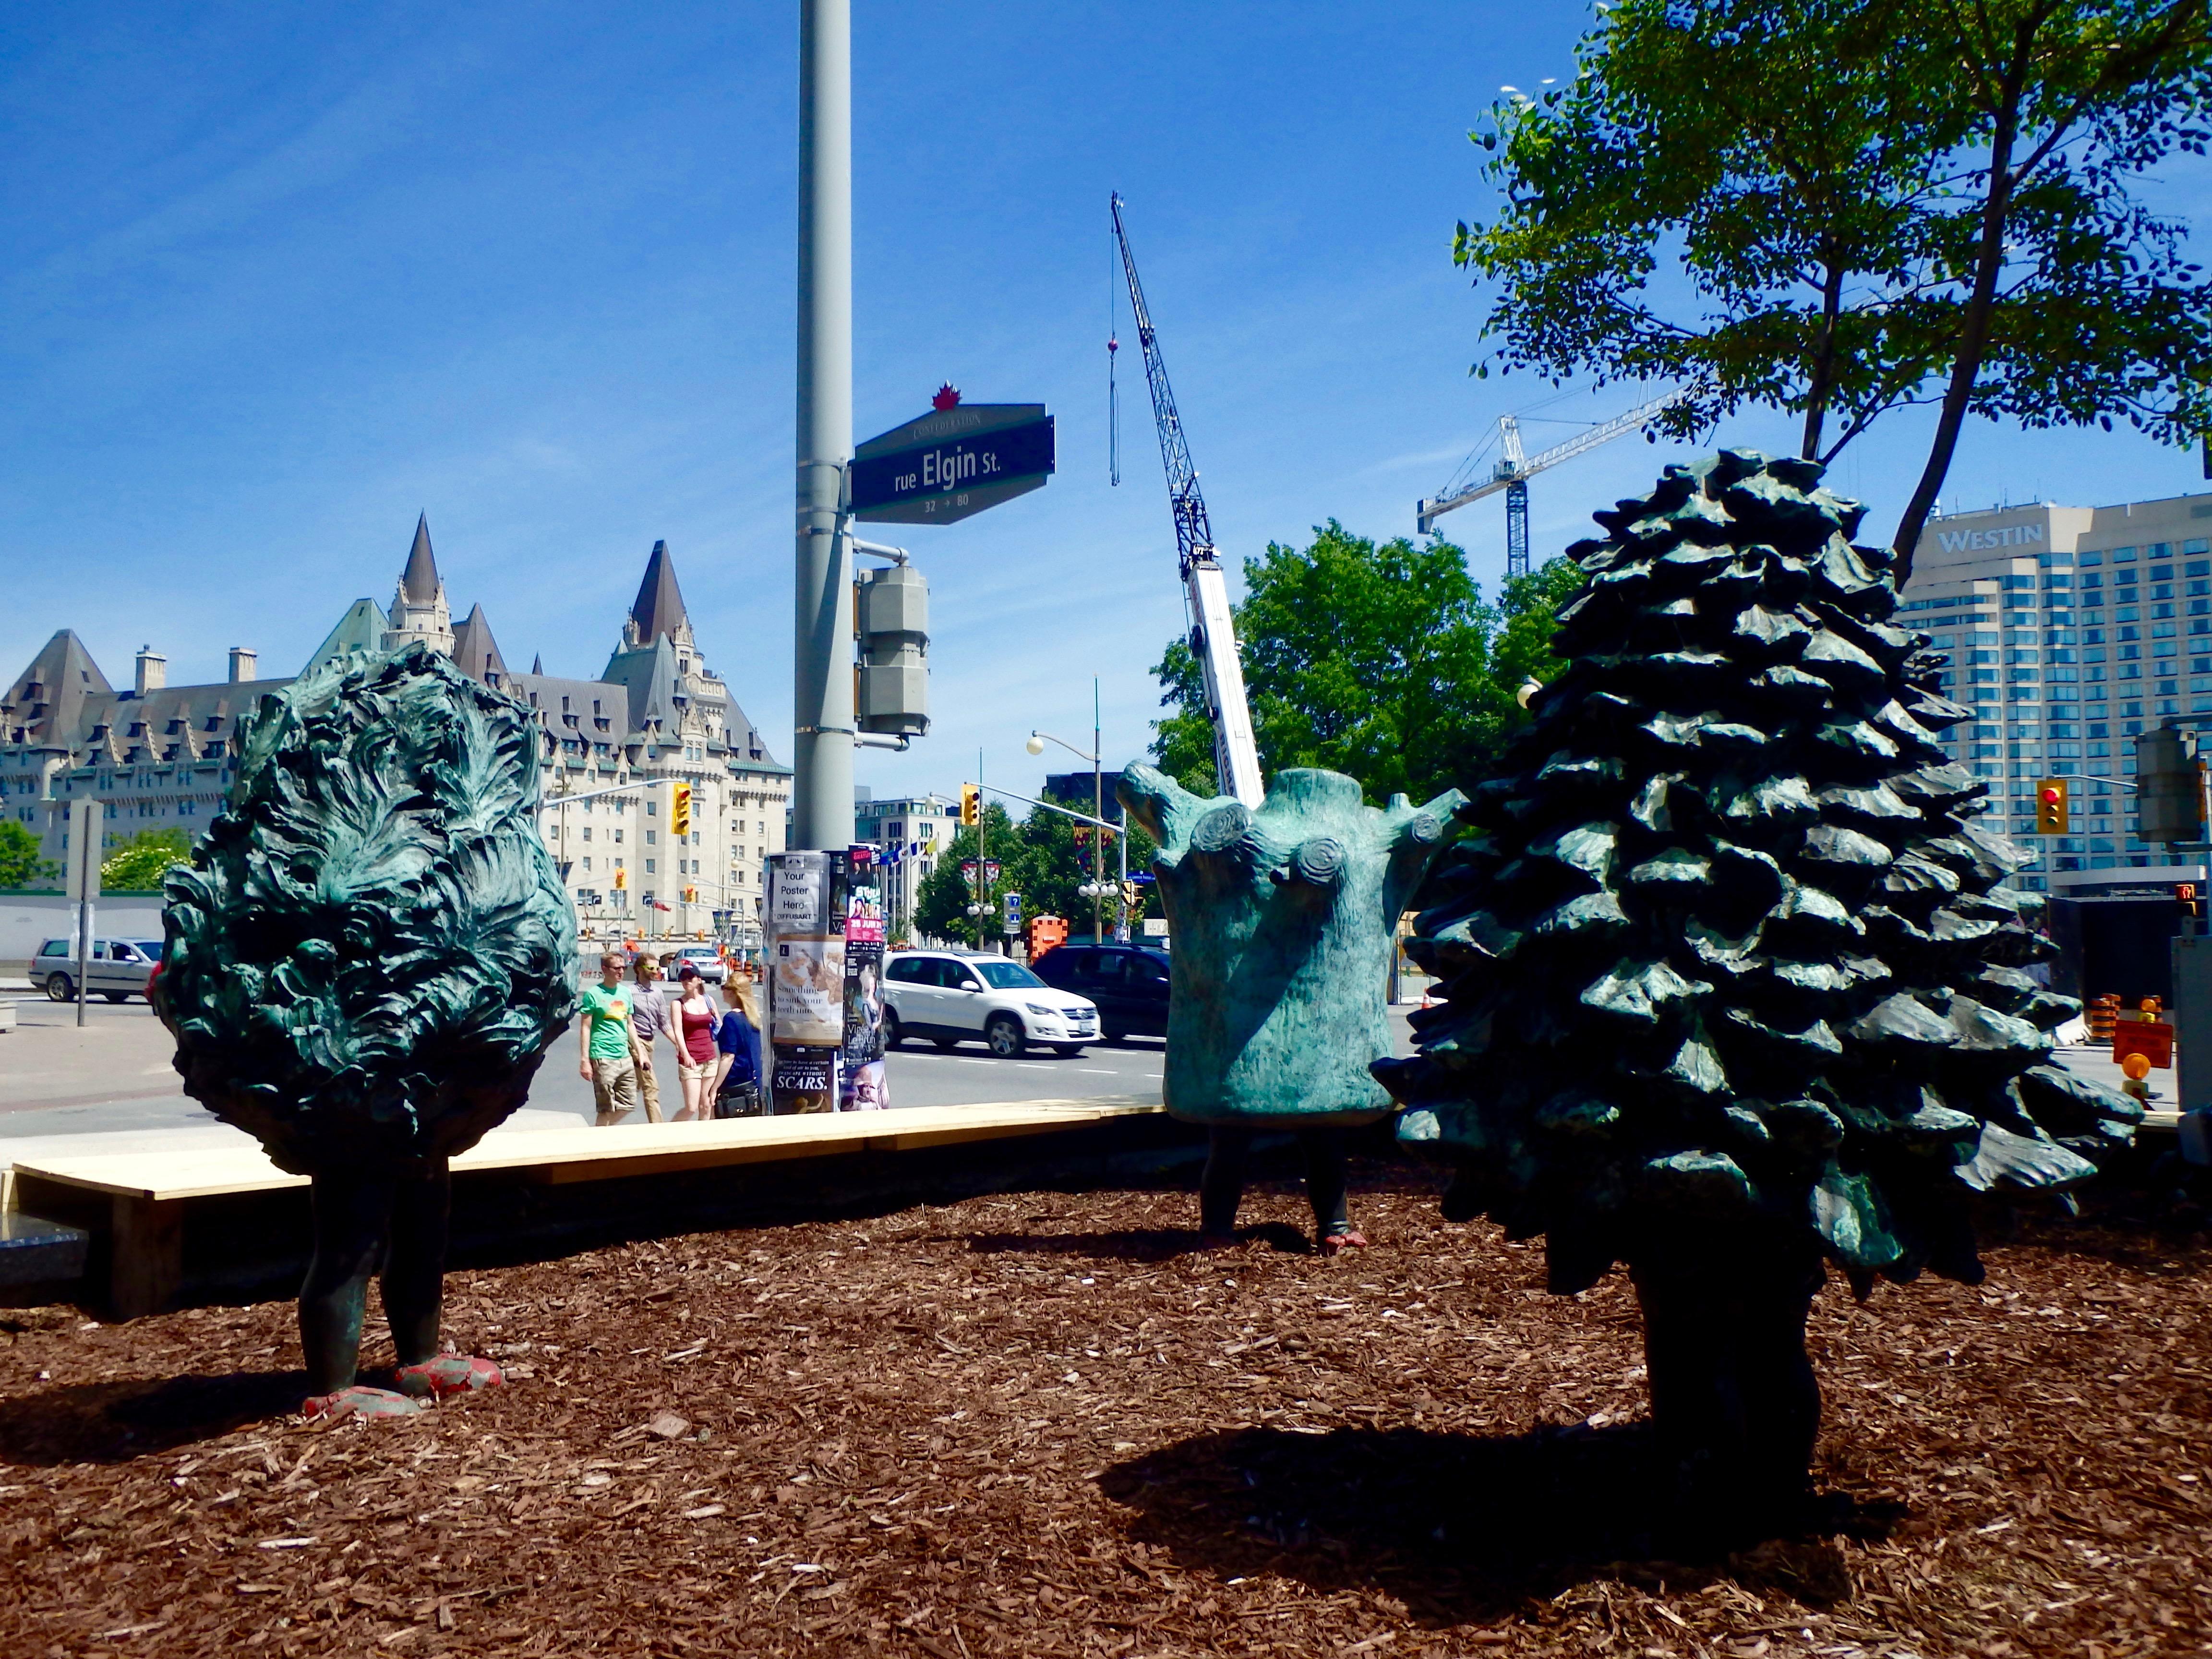 public art in ottawa walking tour where to go in ottawa in 3 days